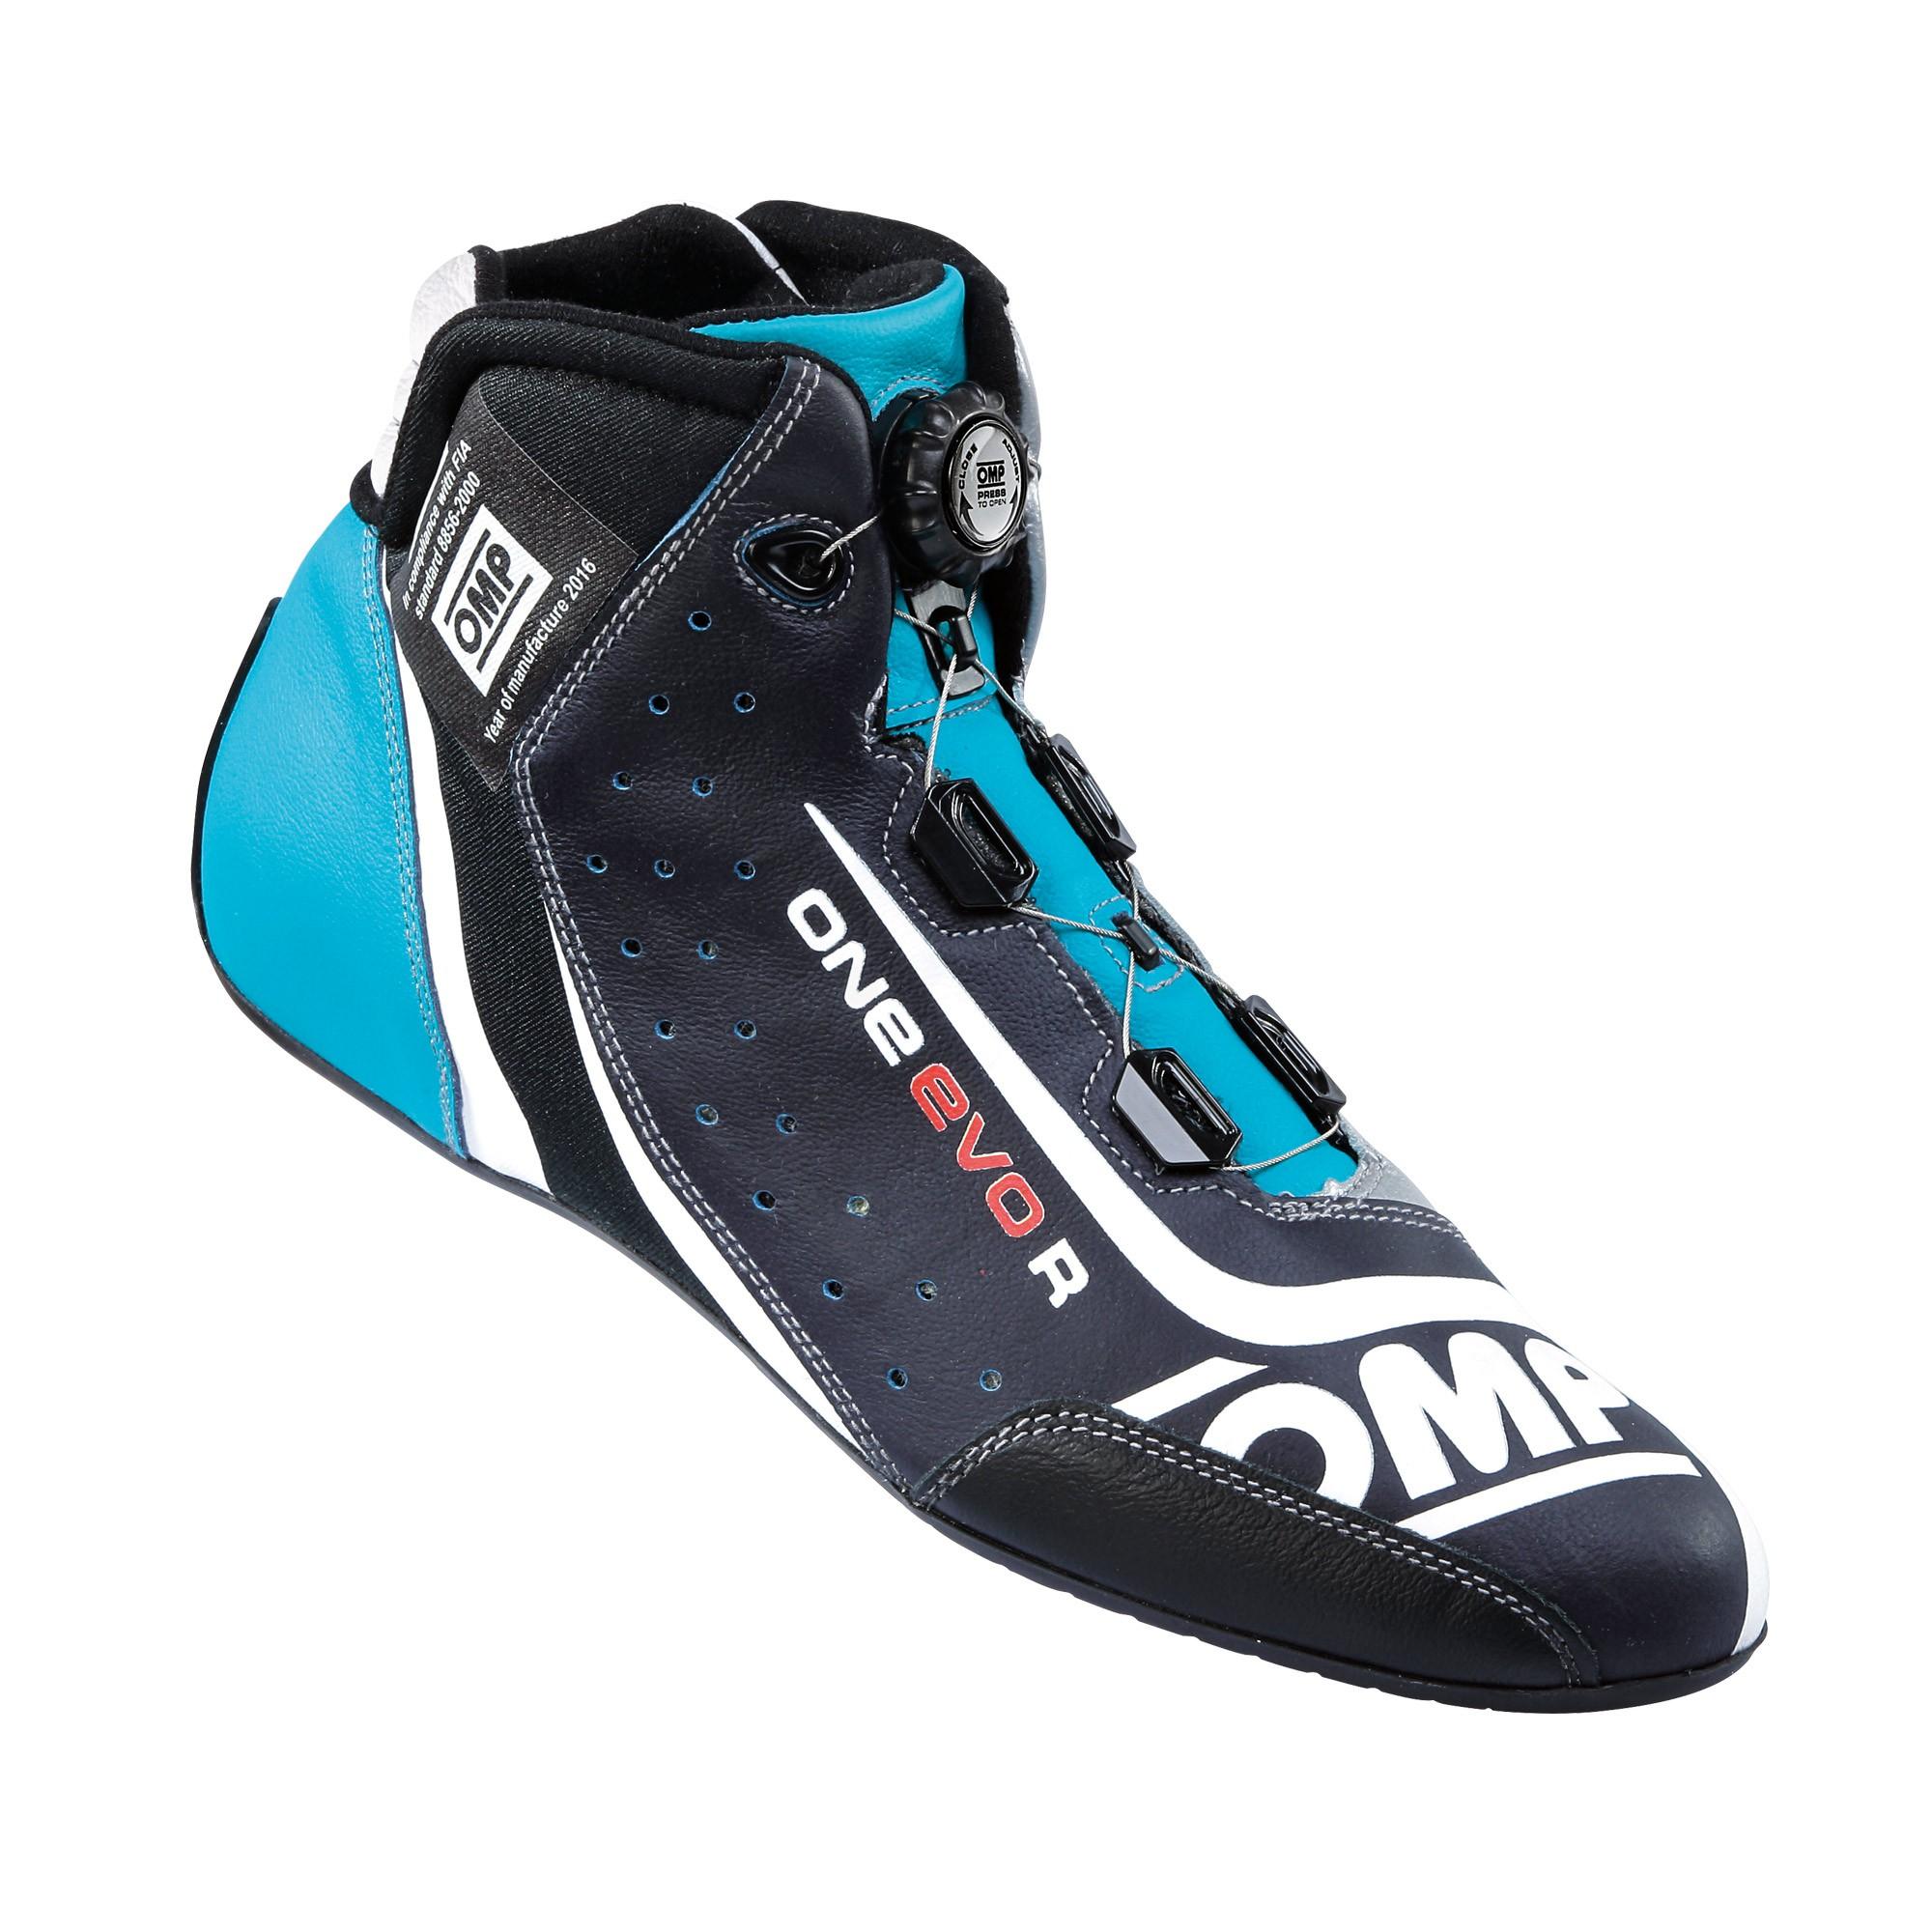 ONE EVO R FORMULA Shoes